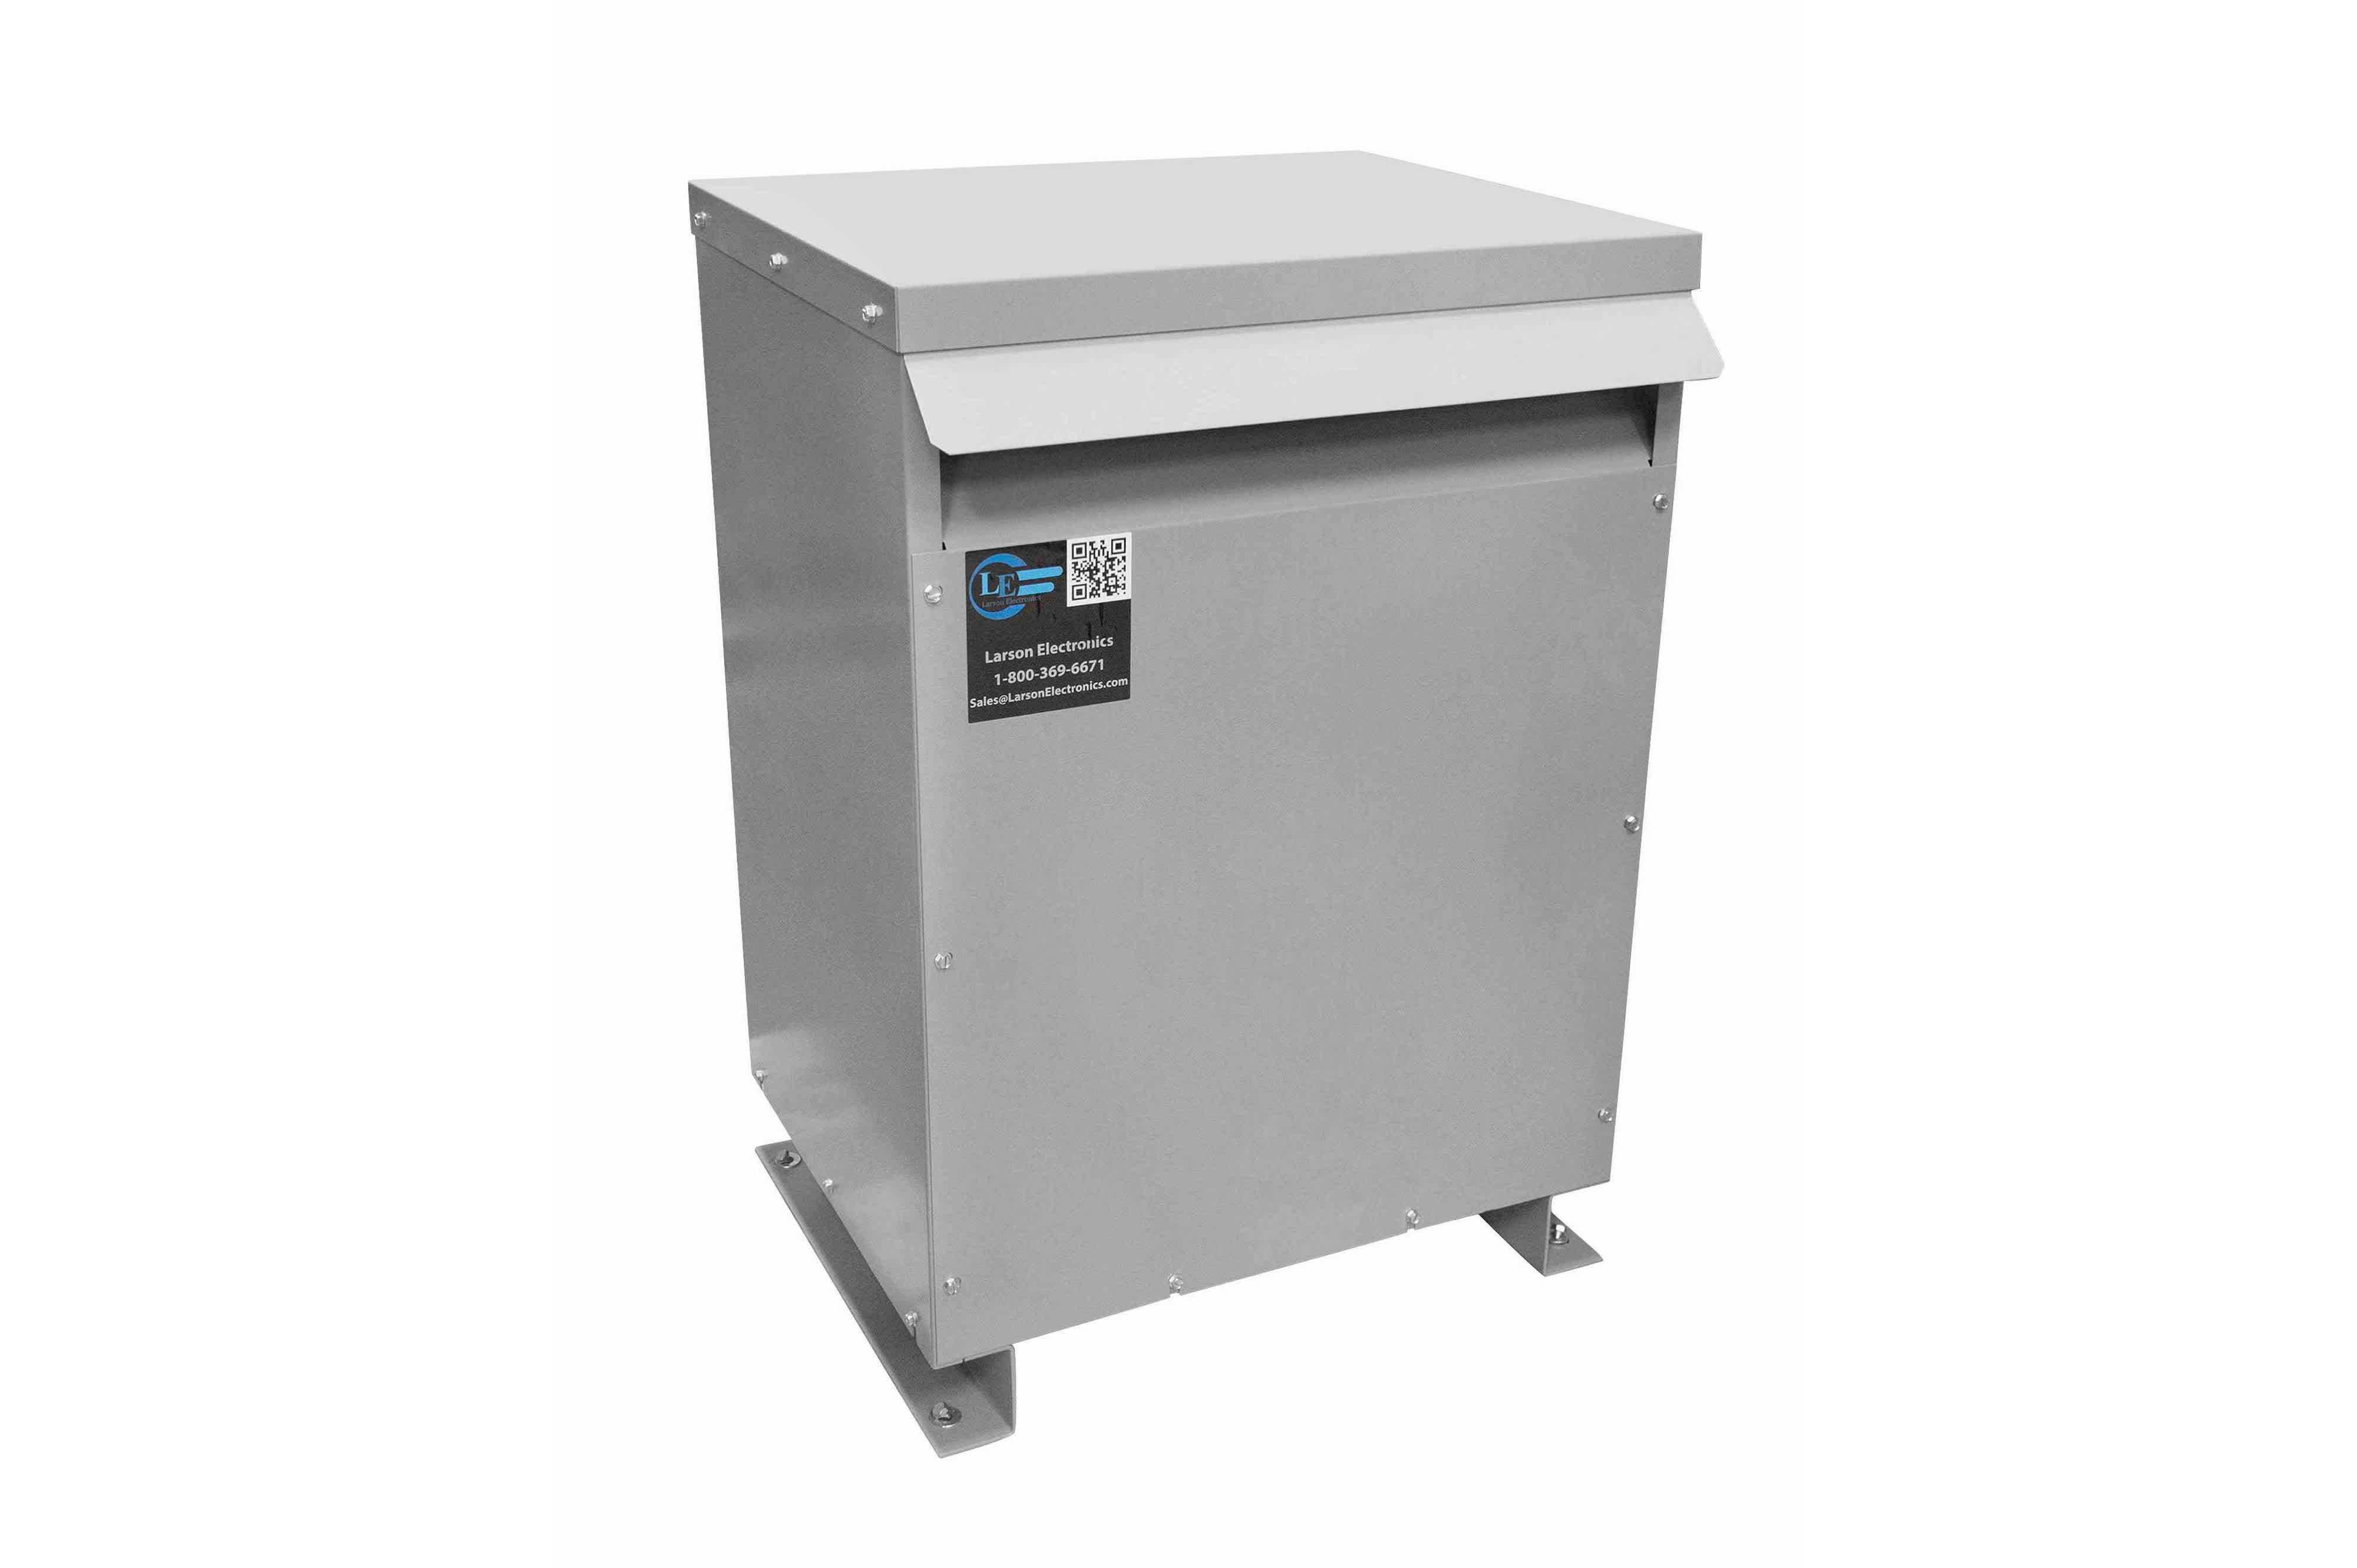 50 kVA 3PH Isolation Transformer, 240V Wye Primary, 600V Delta Secondary, N3R, Ventilated, 60 Hz